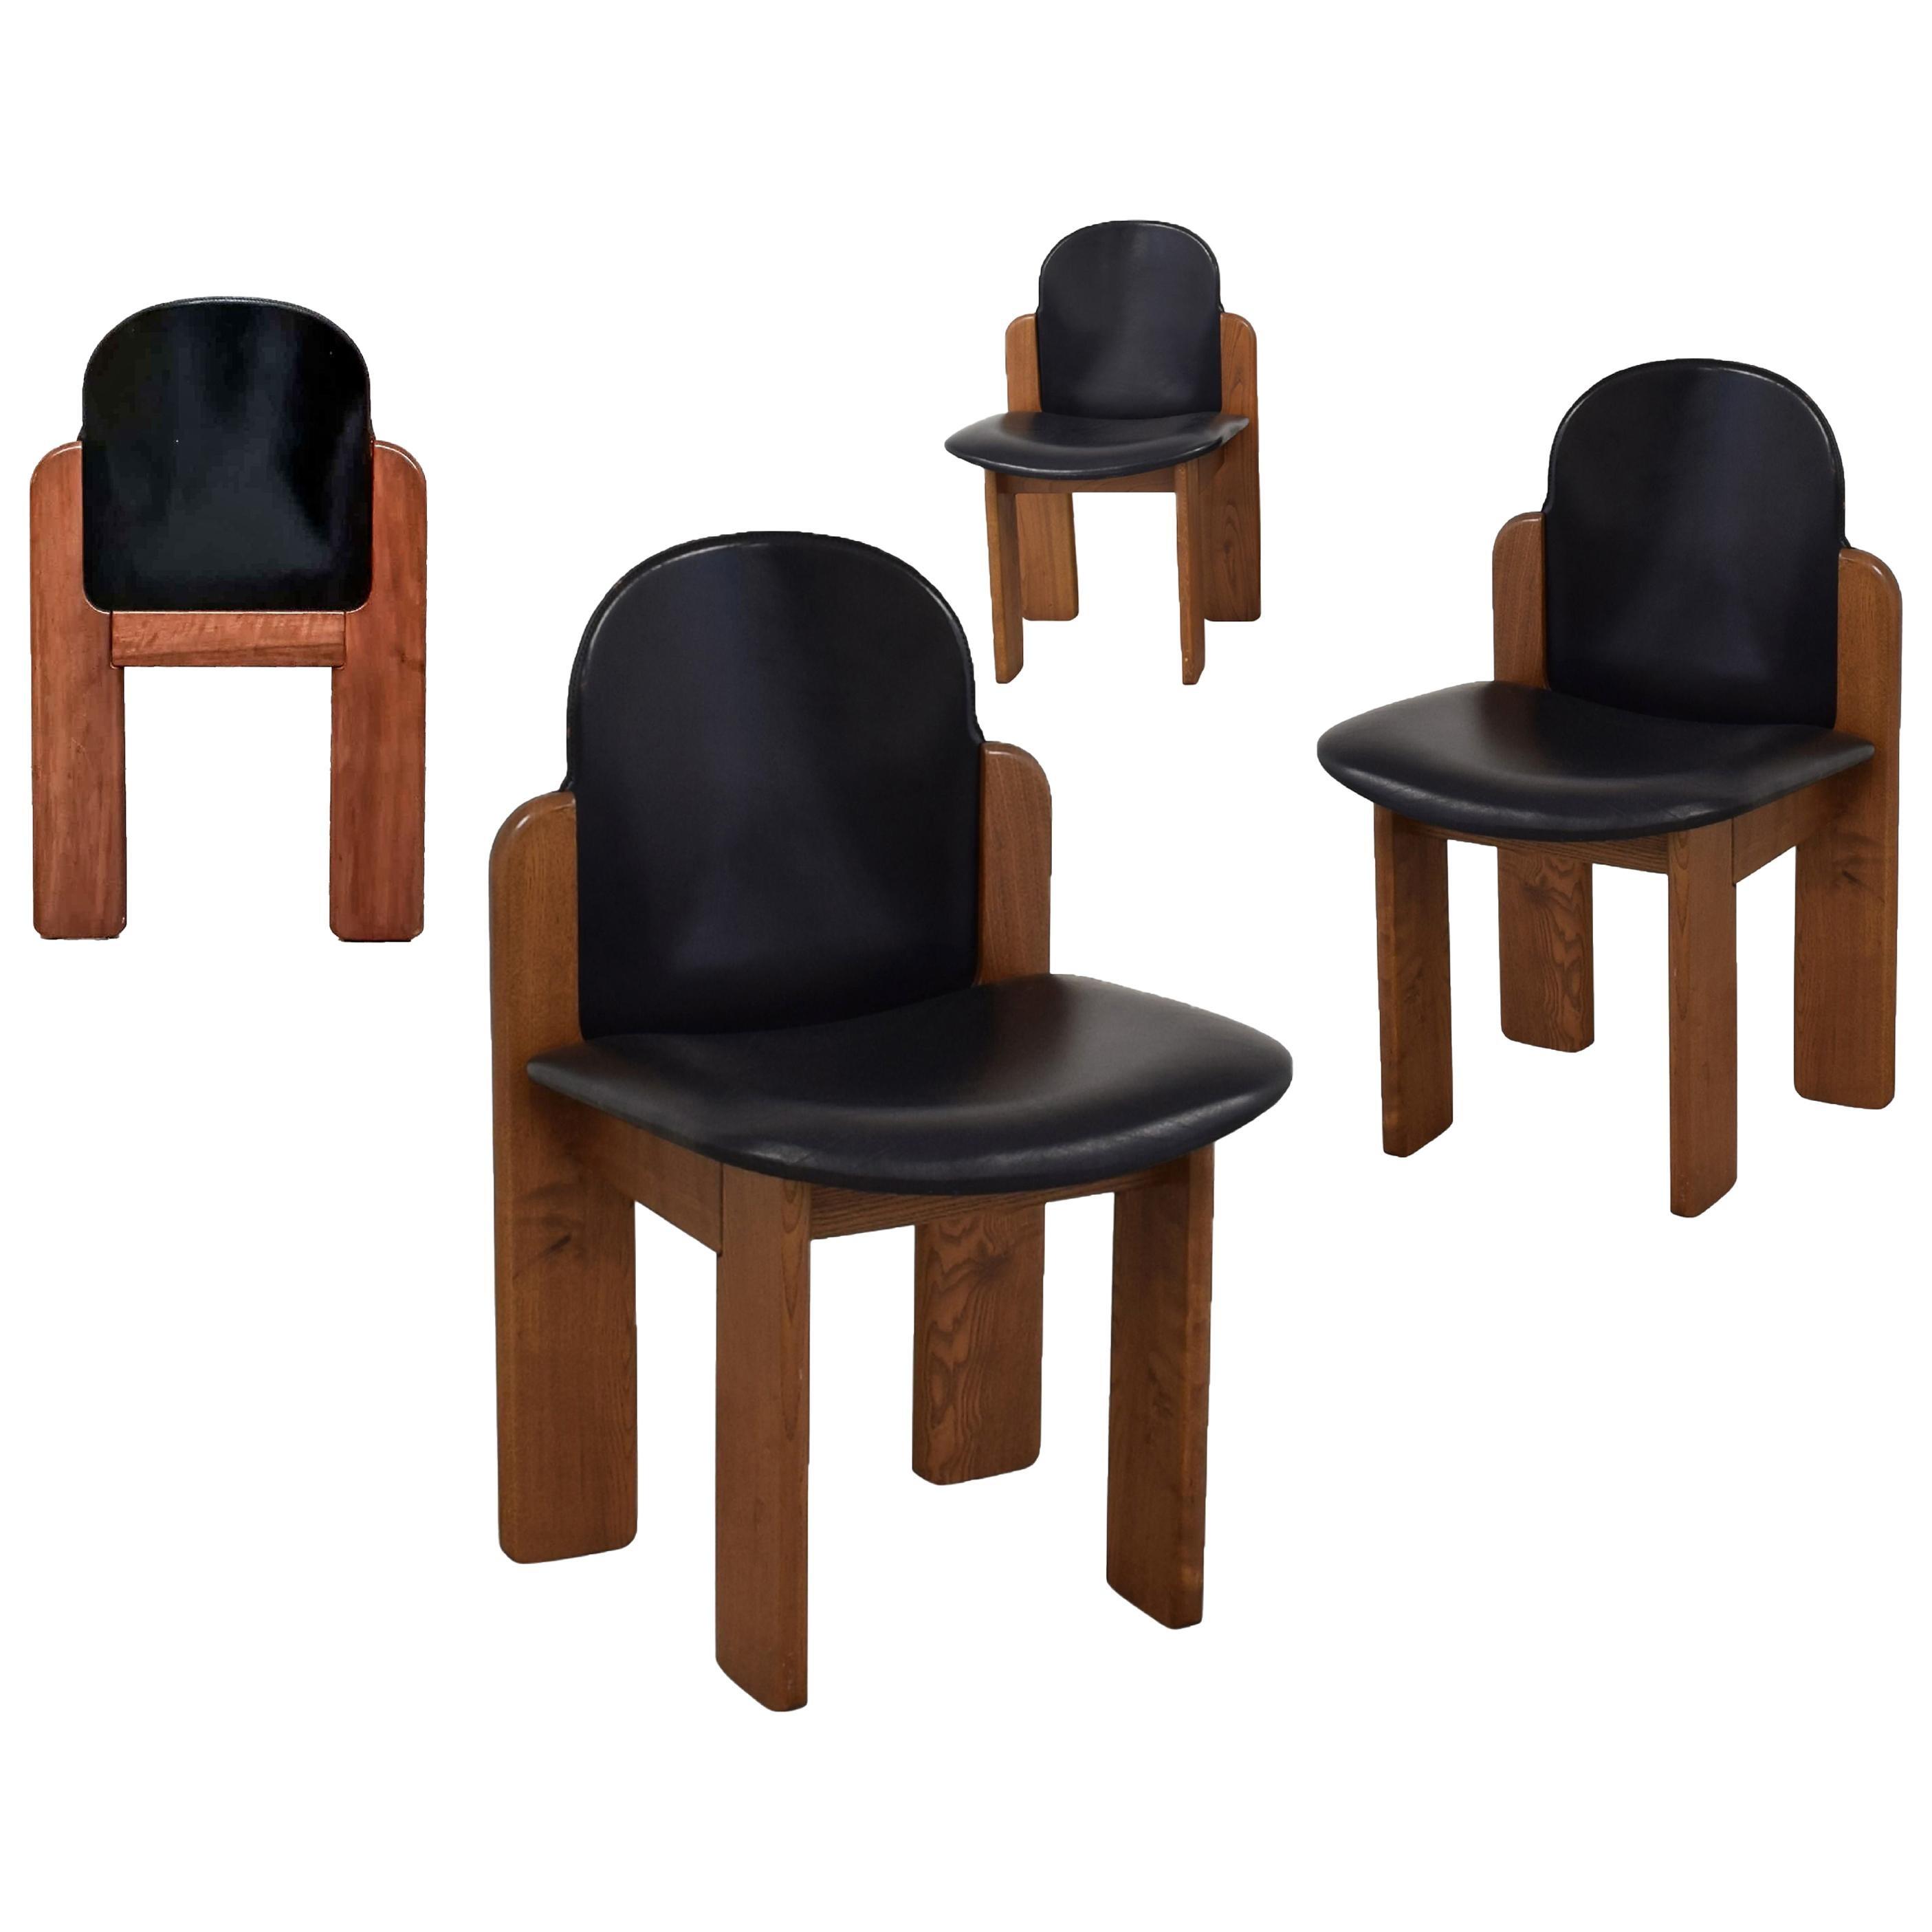 Model 330 Dining Chair, Silvio Coppola, Fratelli Montina, Black Leather, 1970s